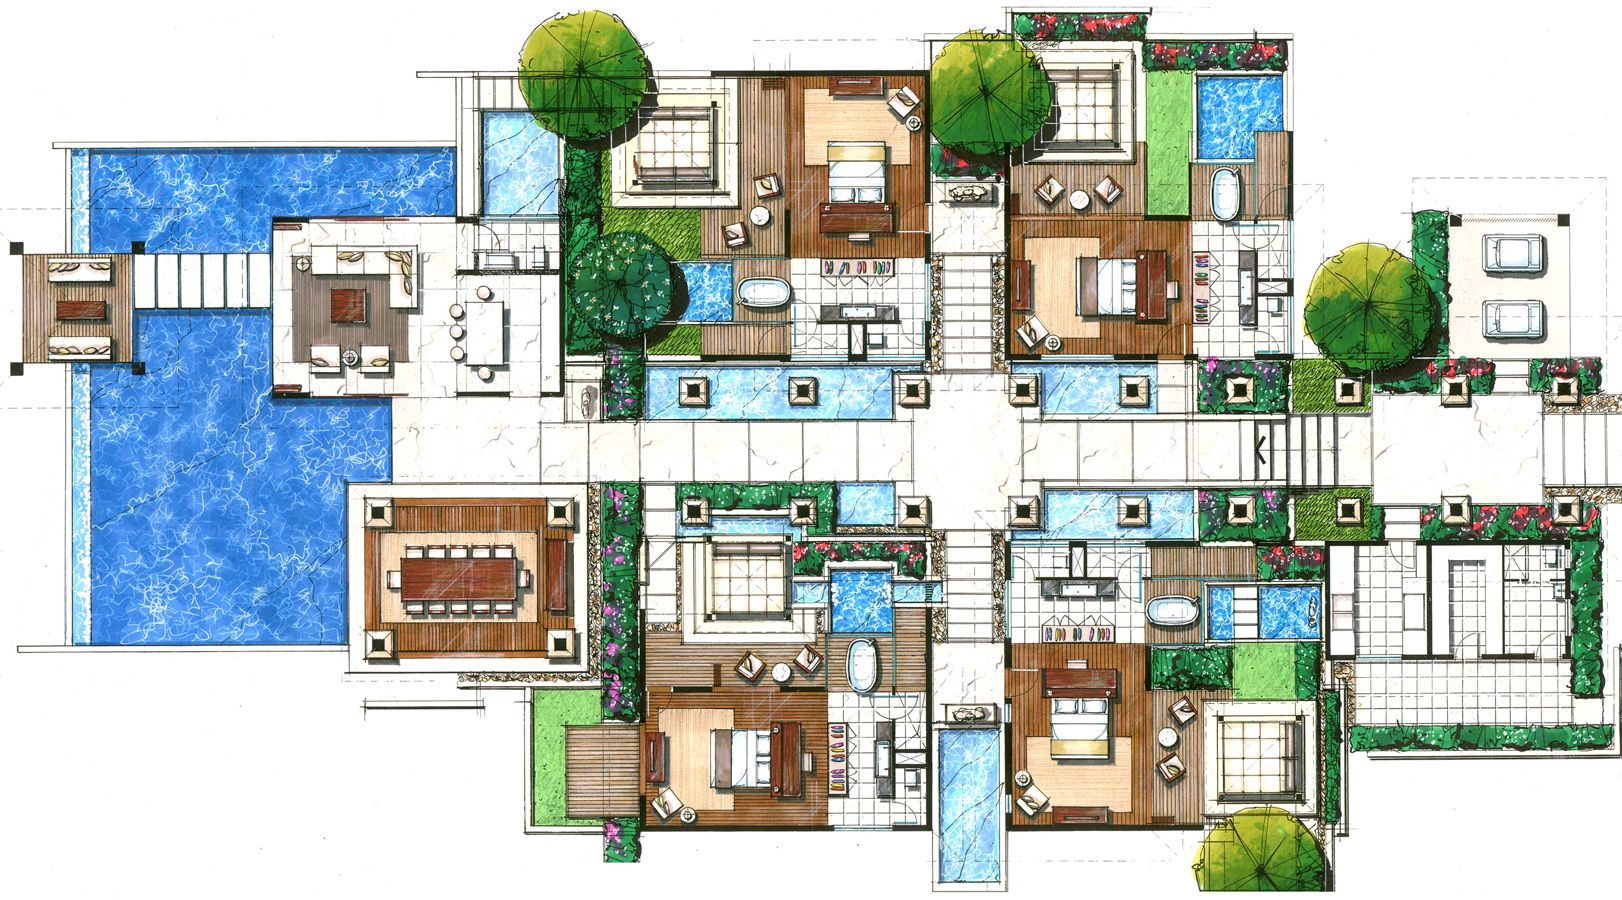 villas floor plans floor plans villas resorts joy studio design gallery best design. Black Bedroom Furniture Sets. Home Design Ideas